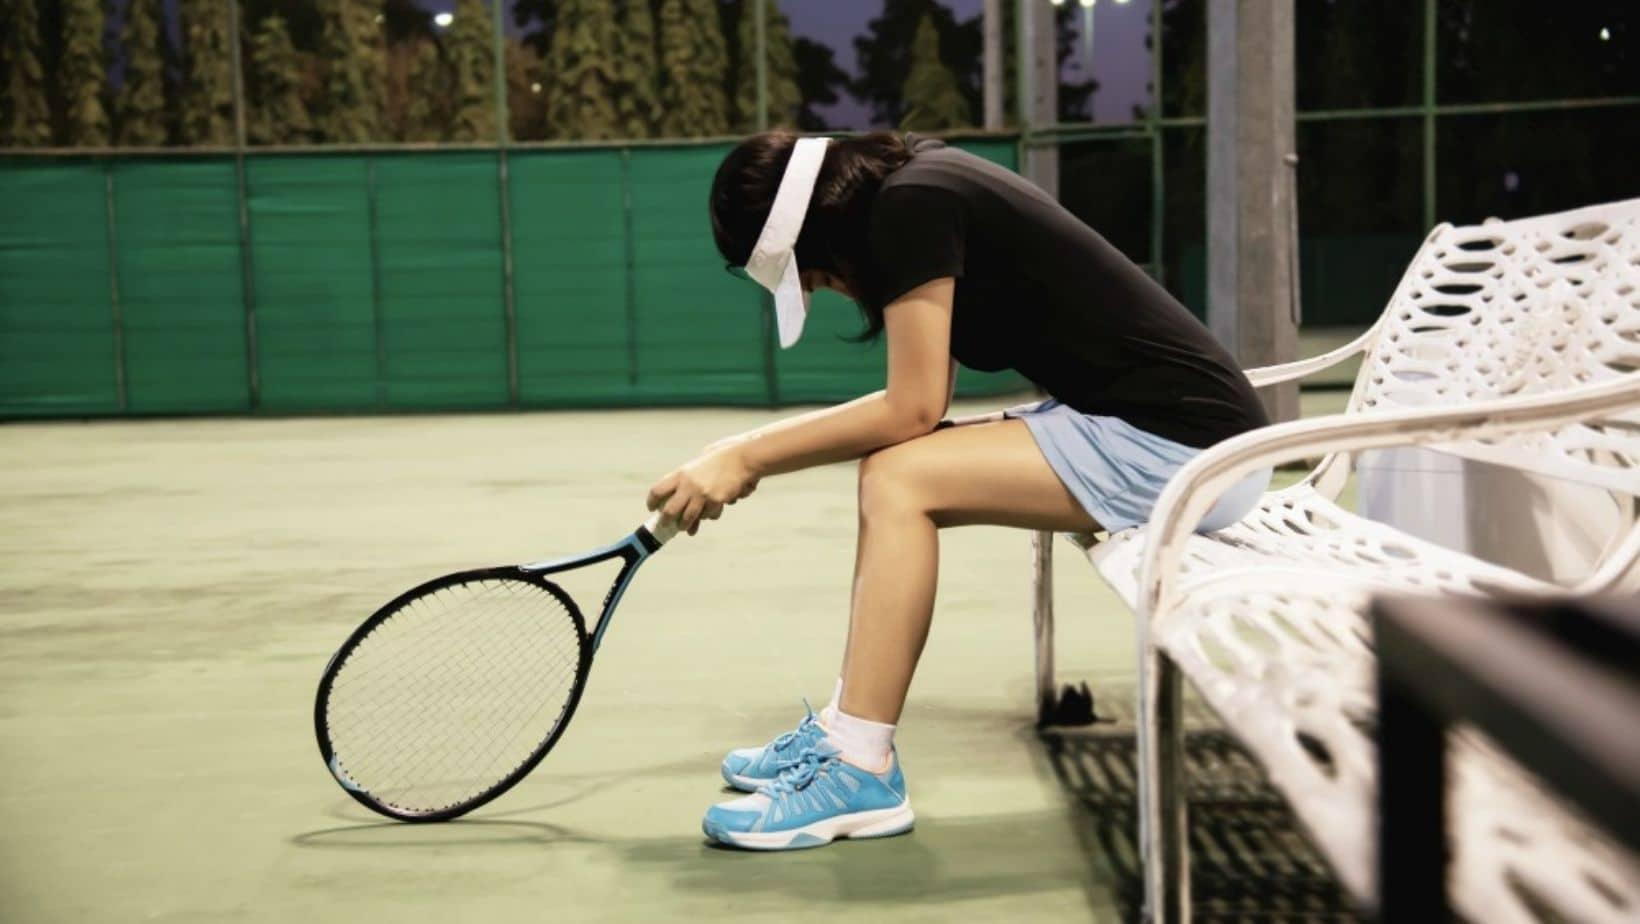 tennis unforced errors